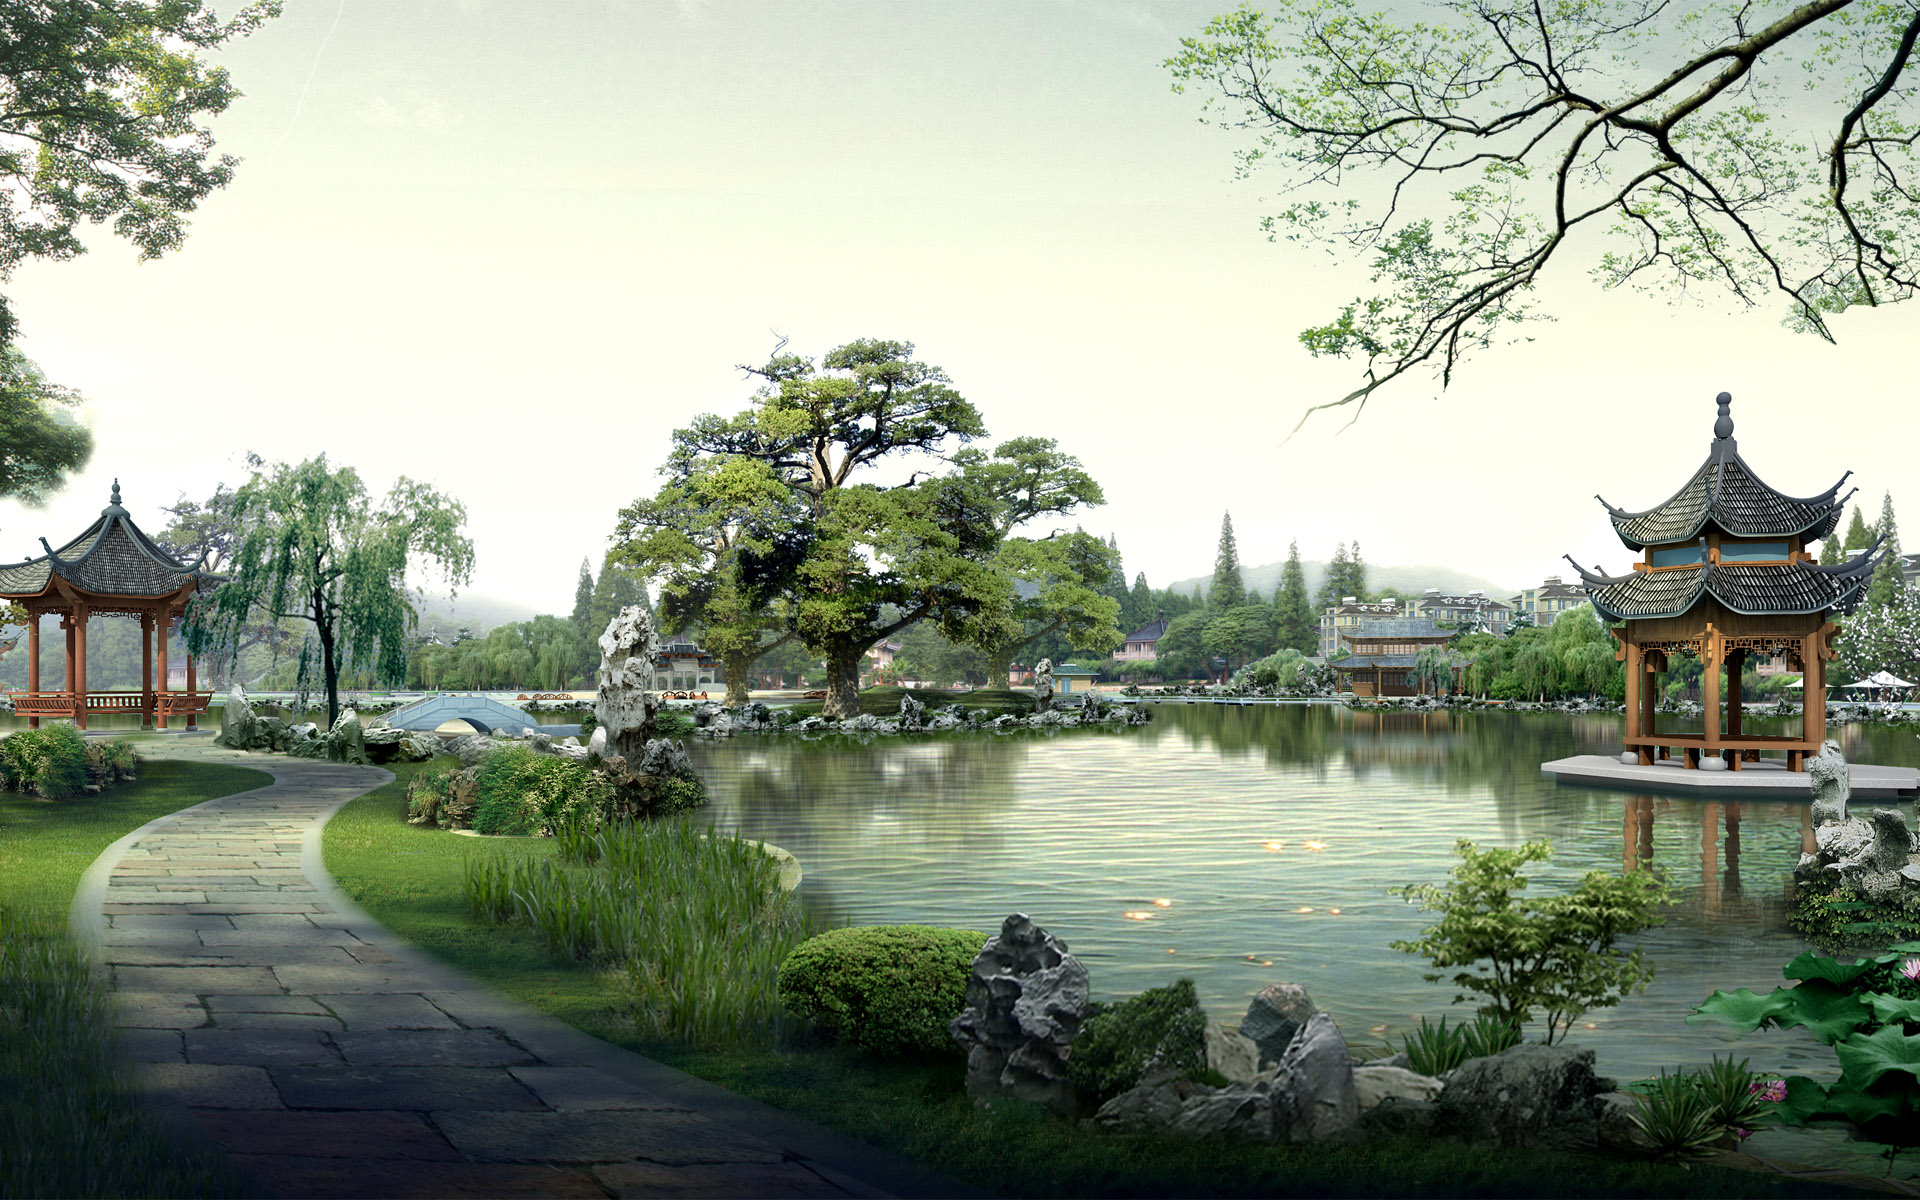 China Digital Landscape 28   Japan Photography Desktop Wallpapers 1920x1200